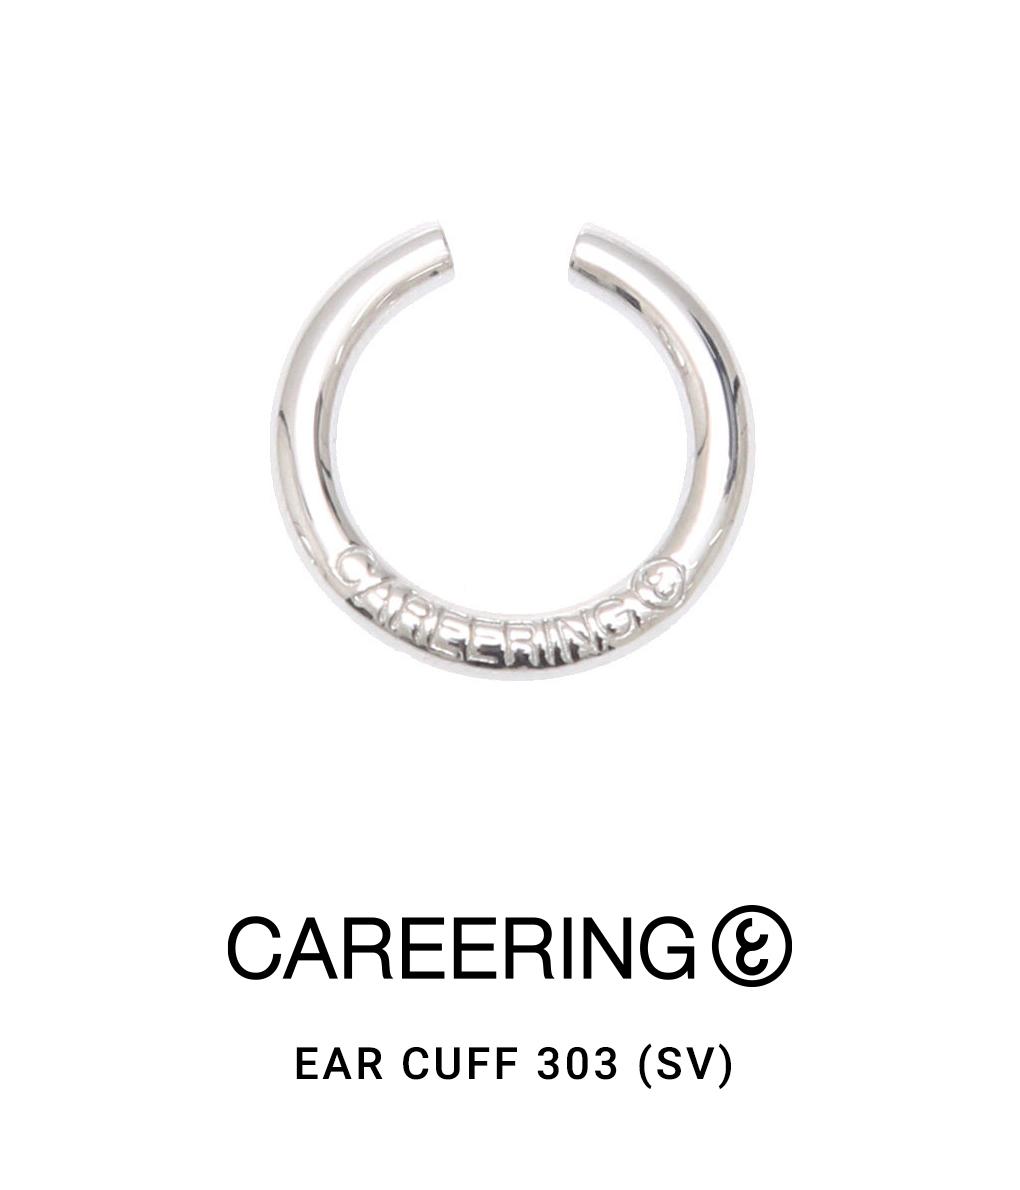 CAREERING / キャリアリング : EAR CUFF 303 (SV) : イヤーカフ アクセサリー メンズ : EAR-CUFF-303-SV 【NOA】